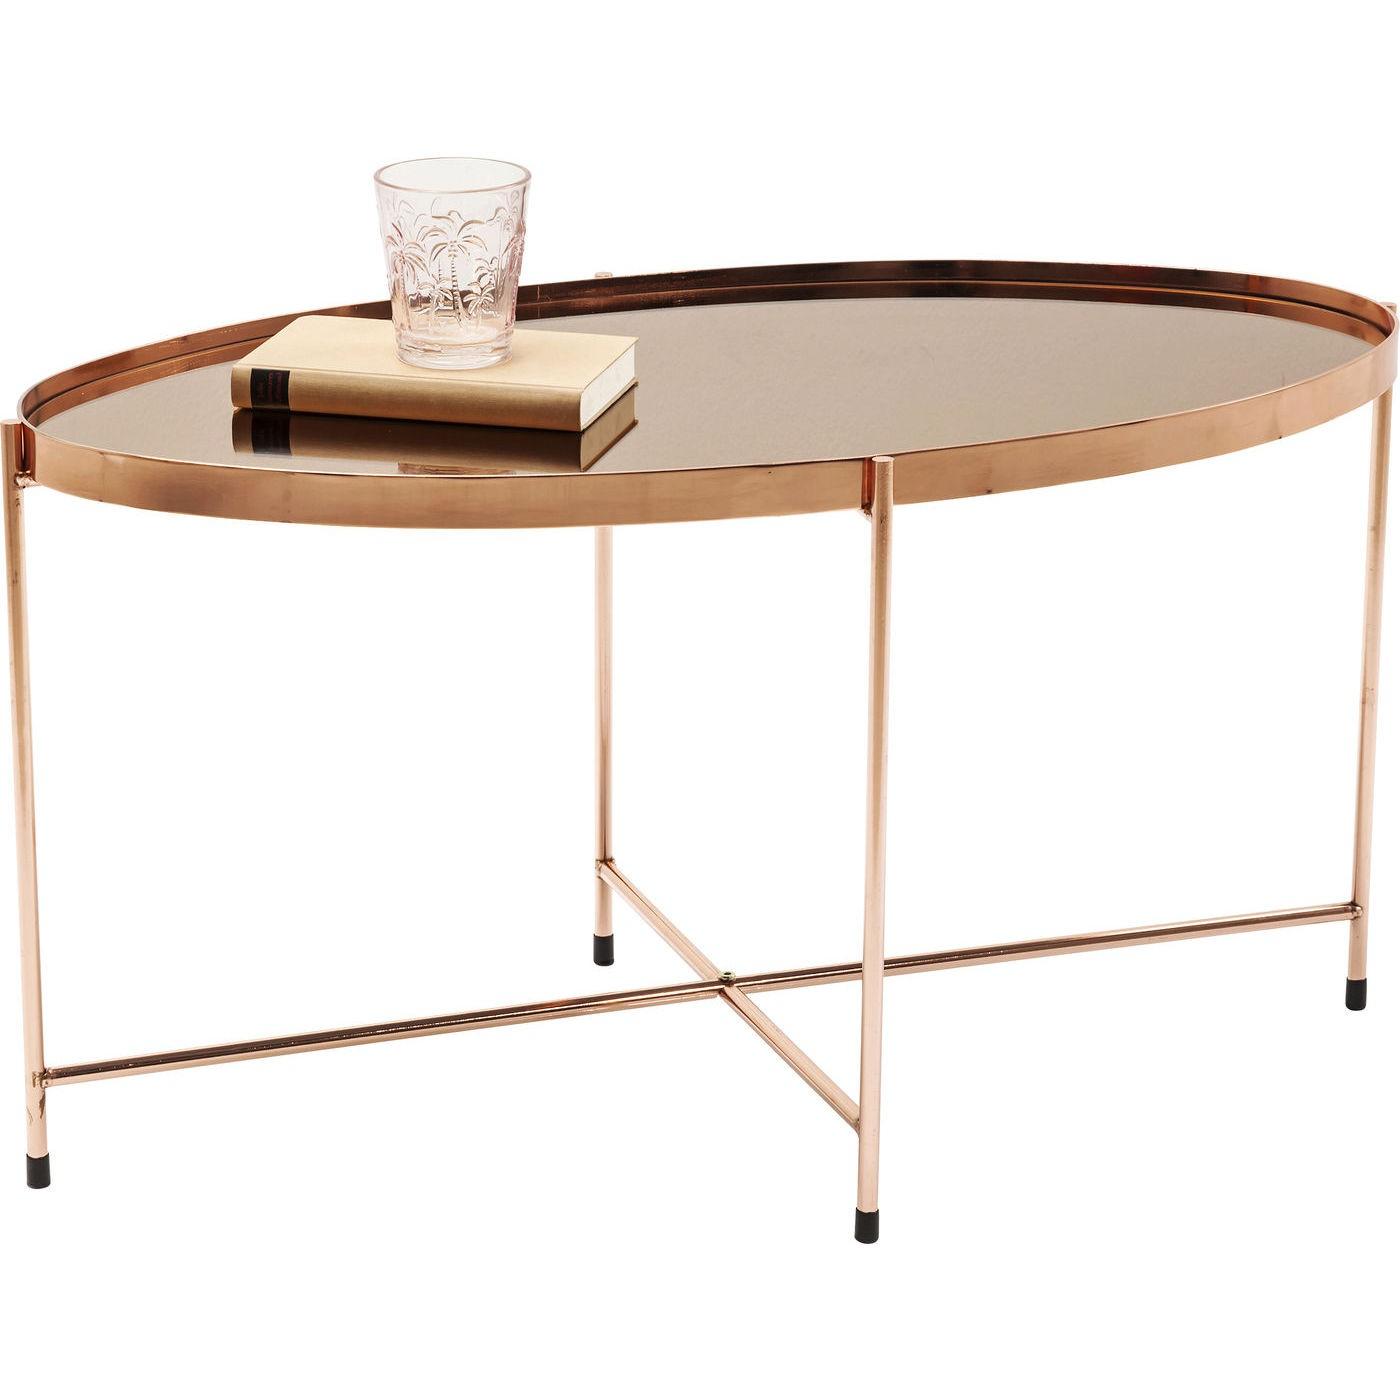 KARE DESIGN Miami sofabord - rosegold spejl og stål, oval (83x40)